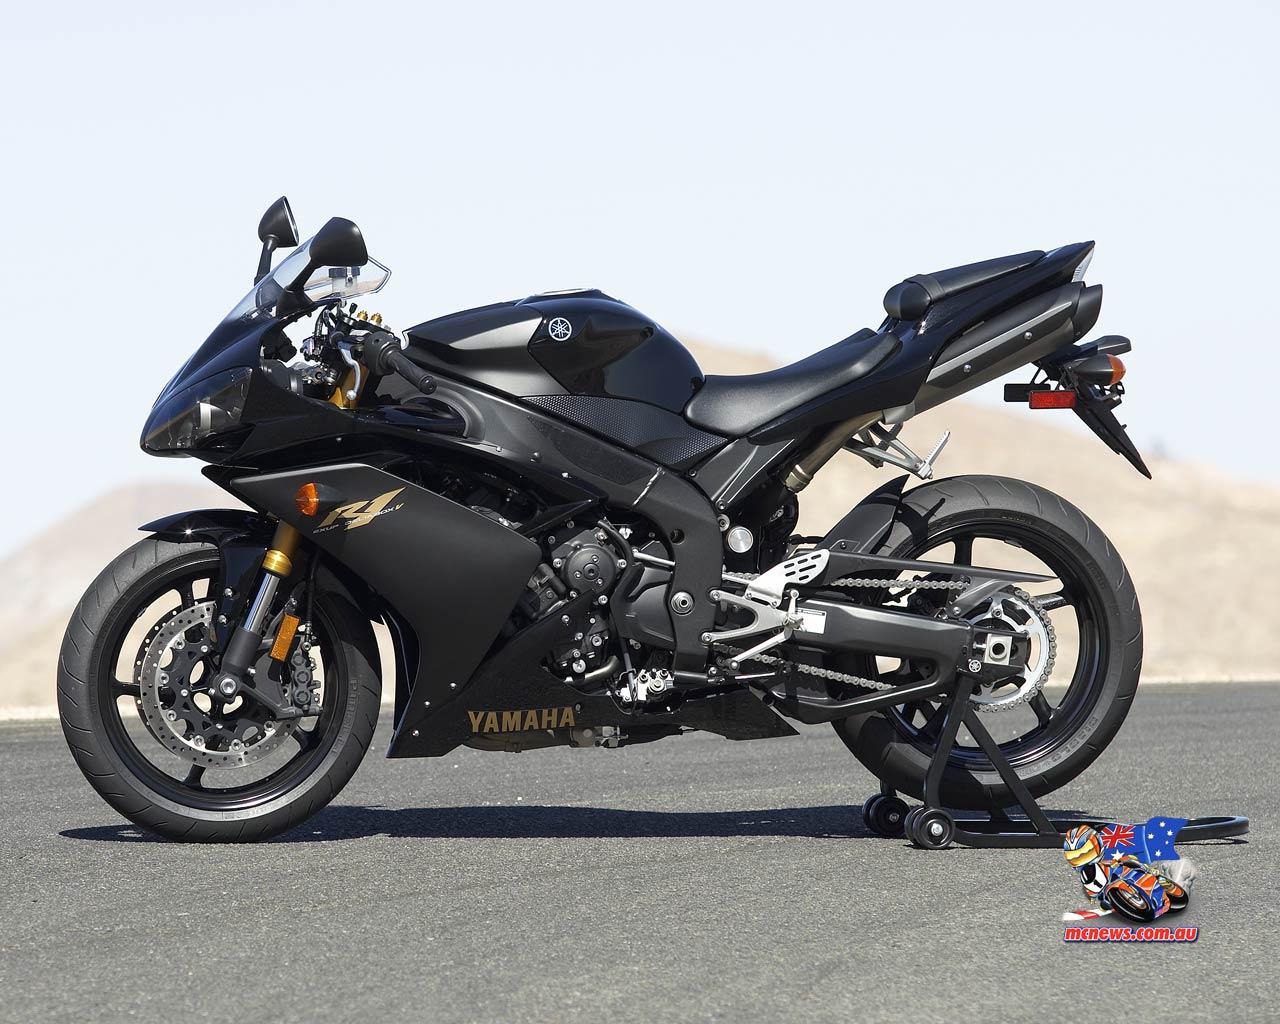 Black Yamaha R1 15573 Hd Wallpapers in Bikes   Imagescicom 1280x1024